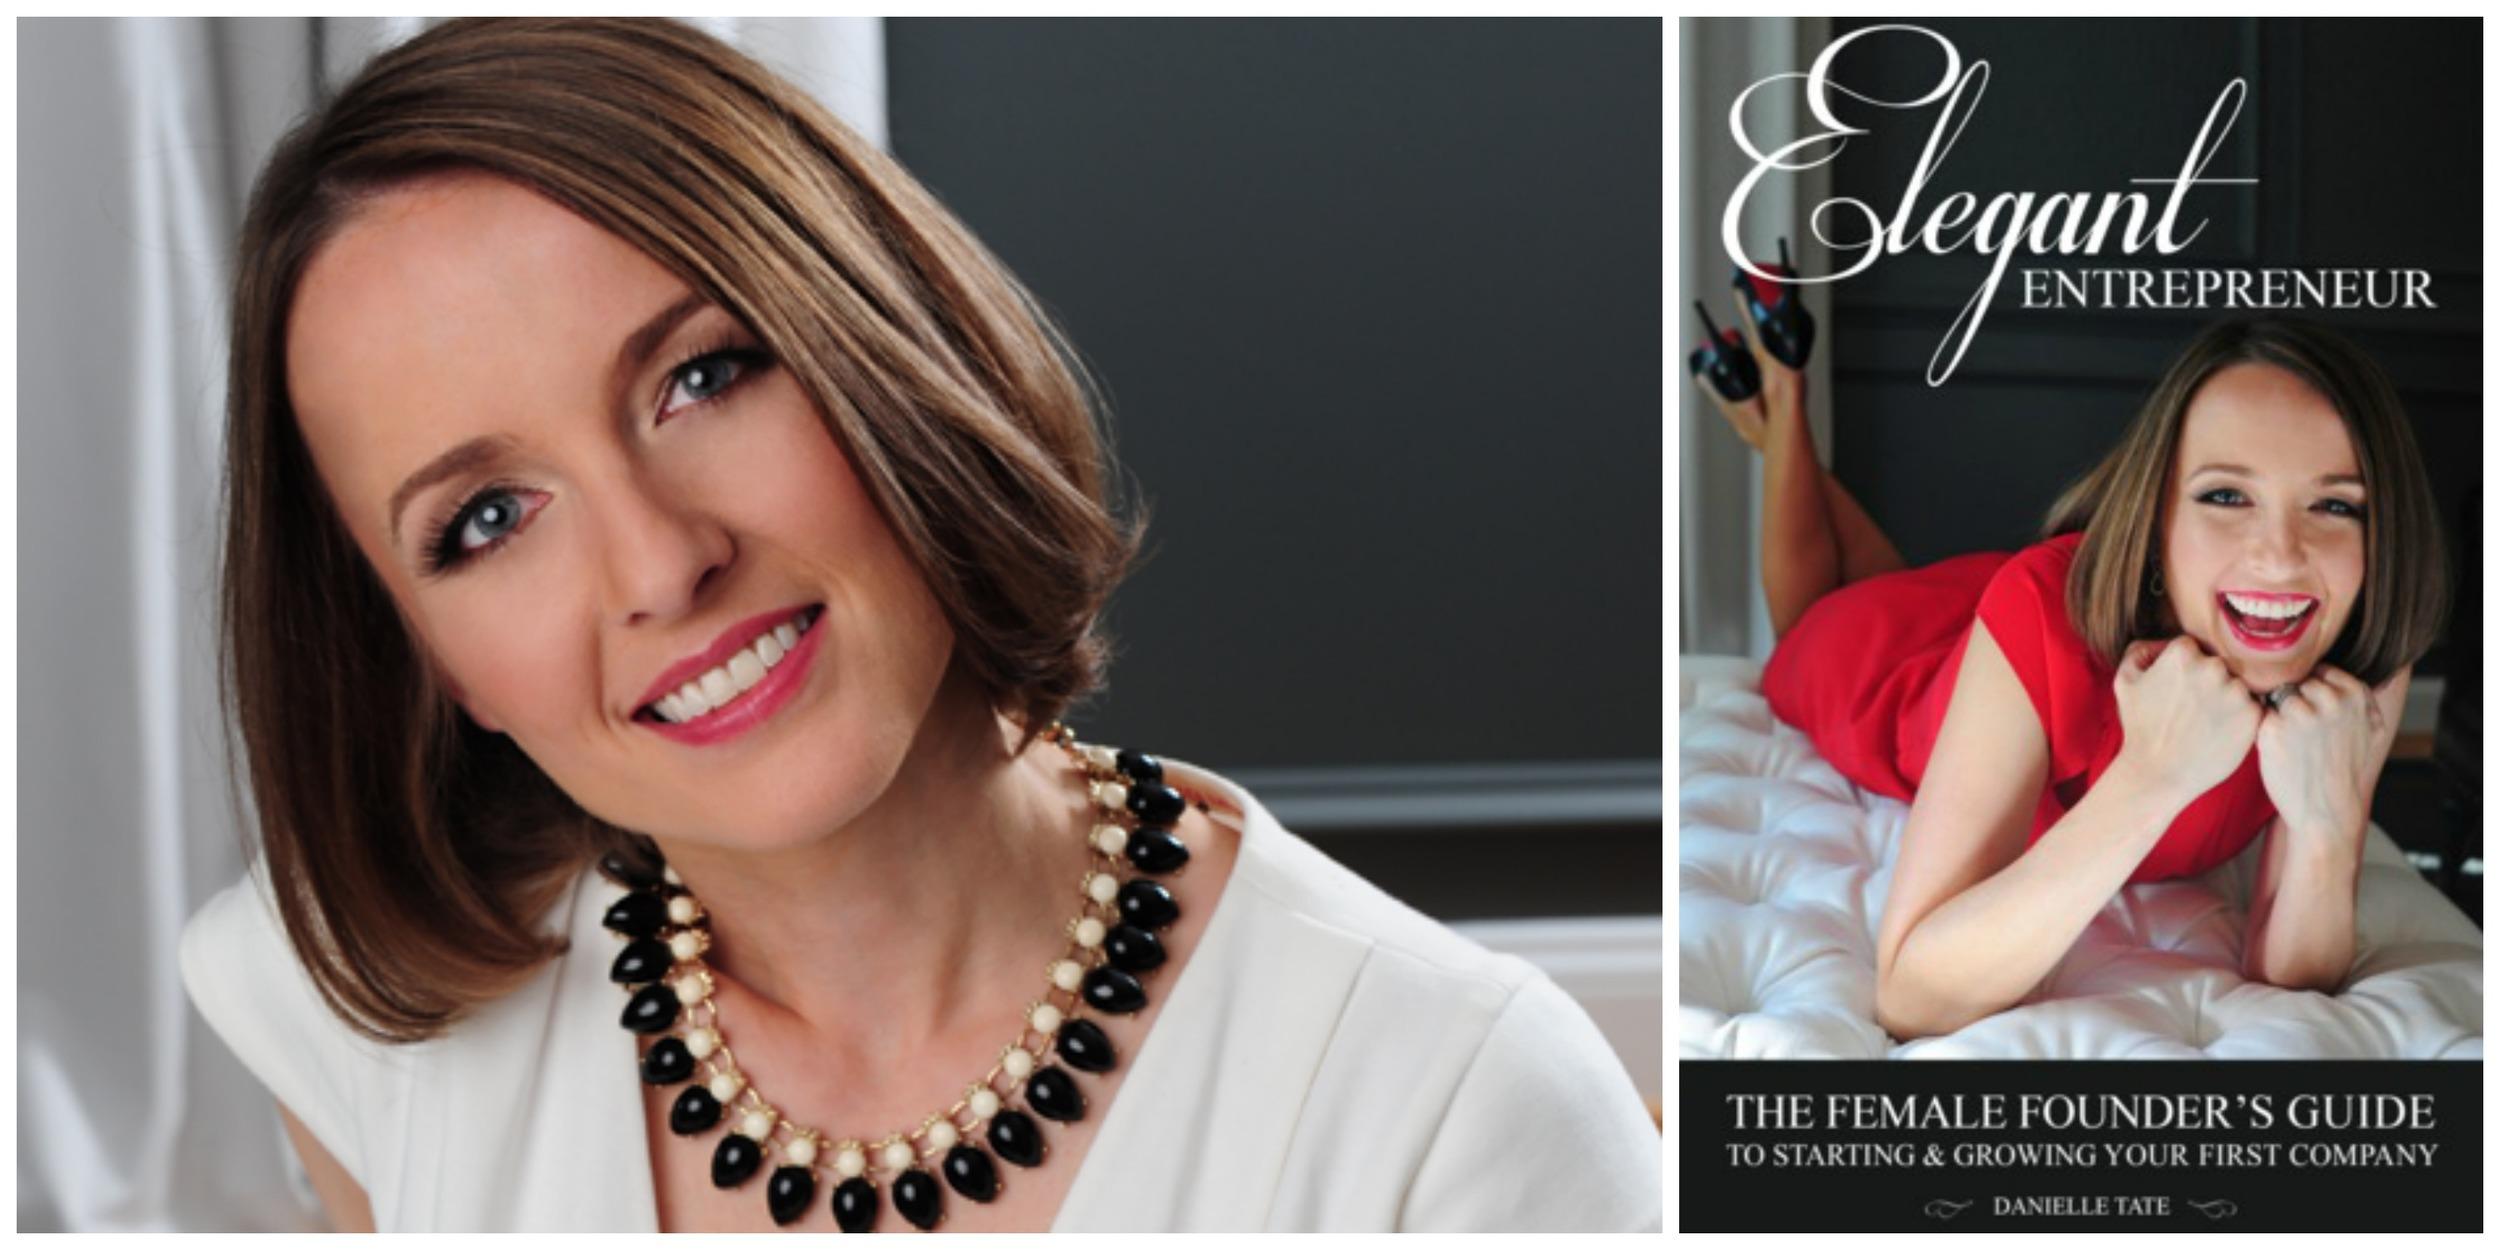 Danielle Tate , author and entrepreneur